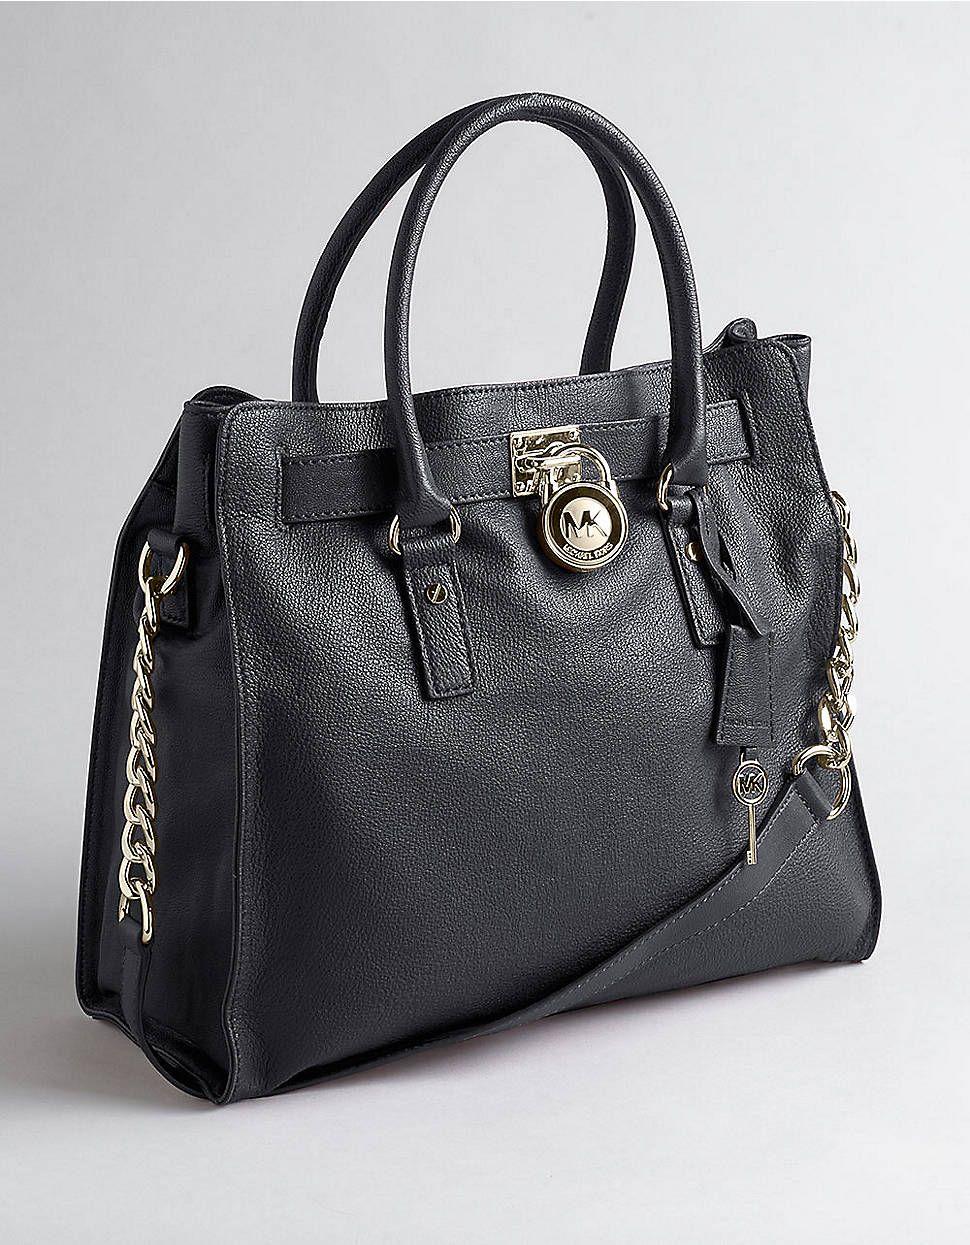 8c87475b255e Michael Michael Kors Hamilton Large Tote Black-I m in love! Wish I could  own this bag!